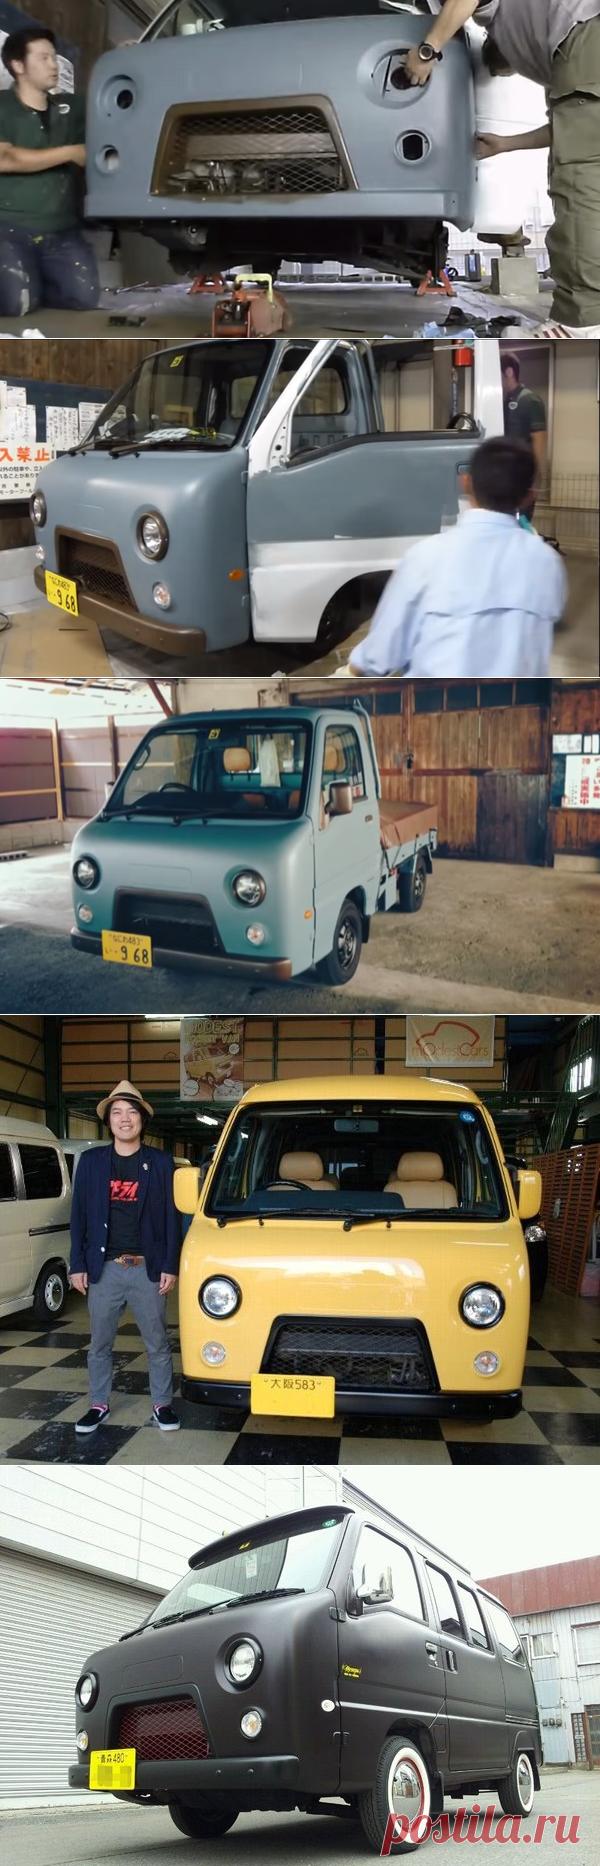 Как в Японии копируют УАЗ «Буханку» | Старый Гараж | Яндекс Дзен